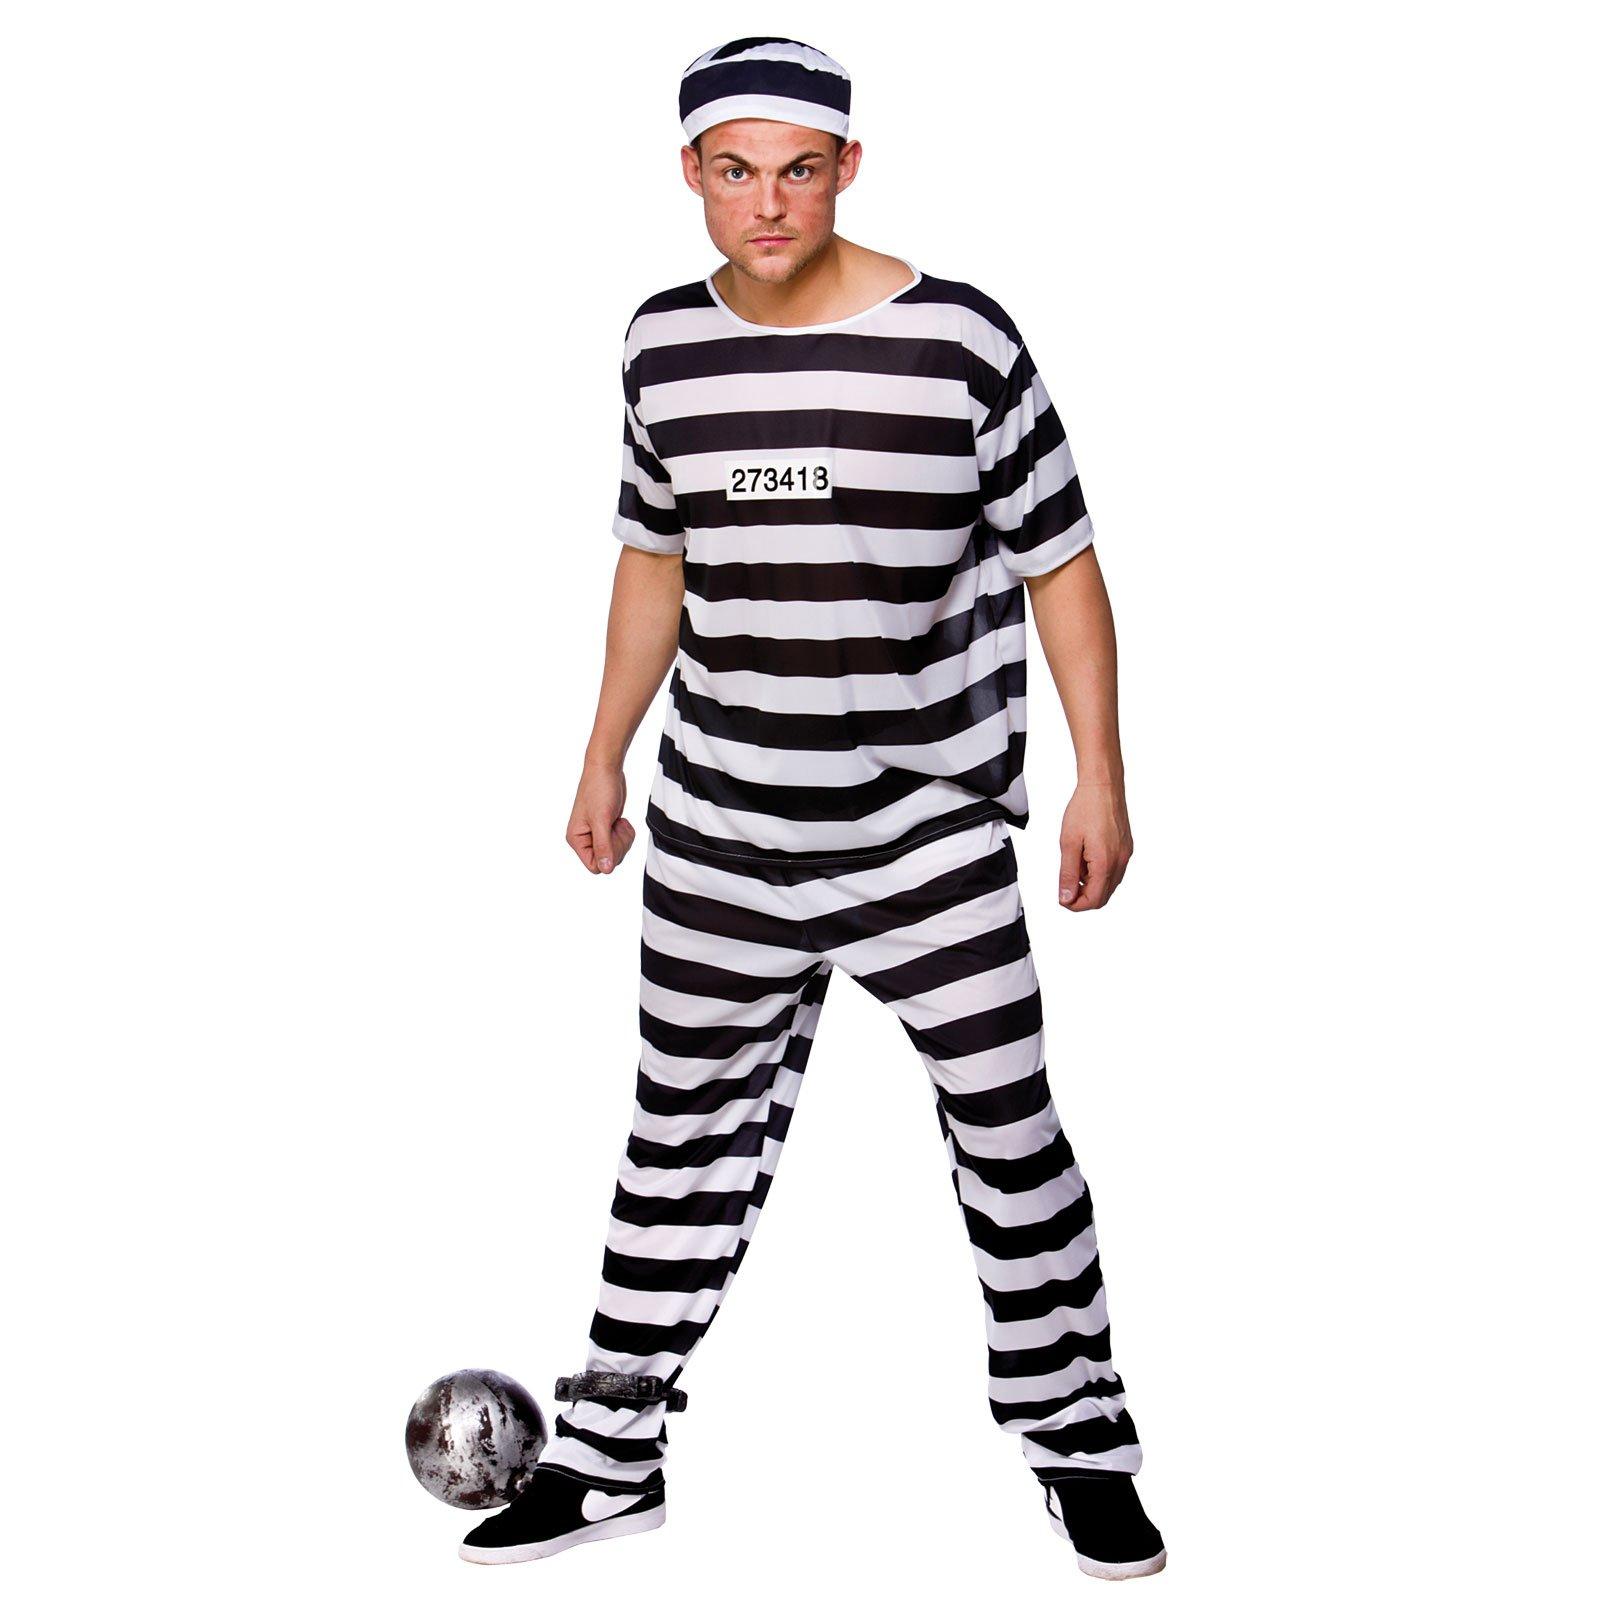 Prison Break Convict - Adult Costume Men  LARGE  sc 1 st  Amazon UK & Prisoner Costume: Amazon.co.uk